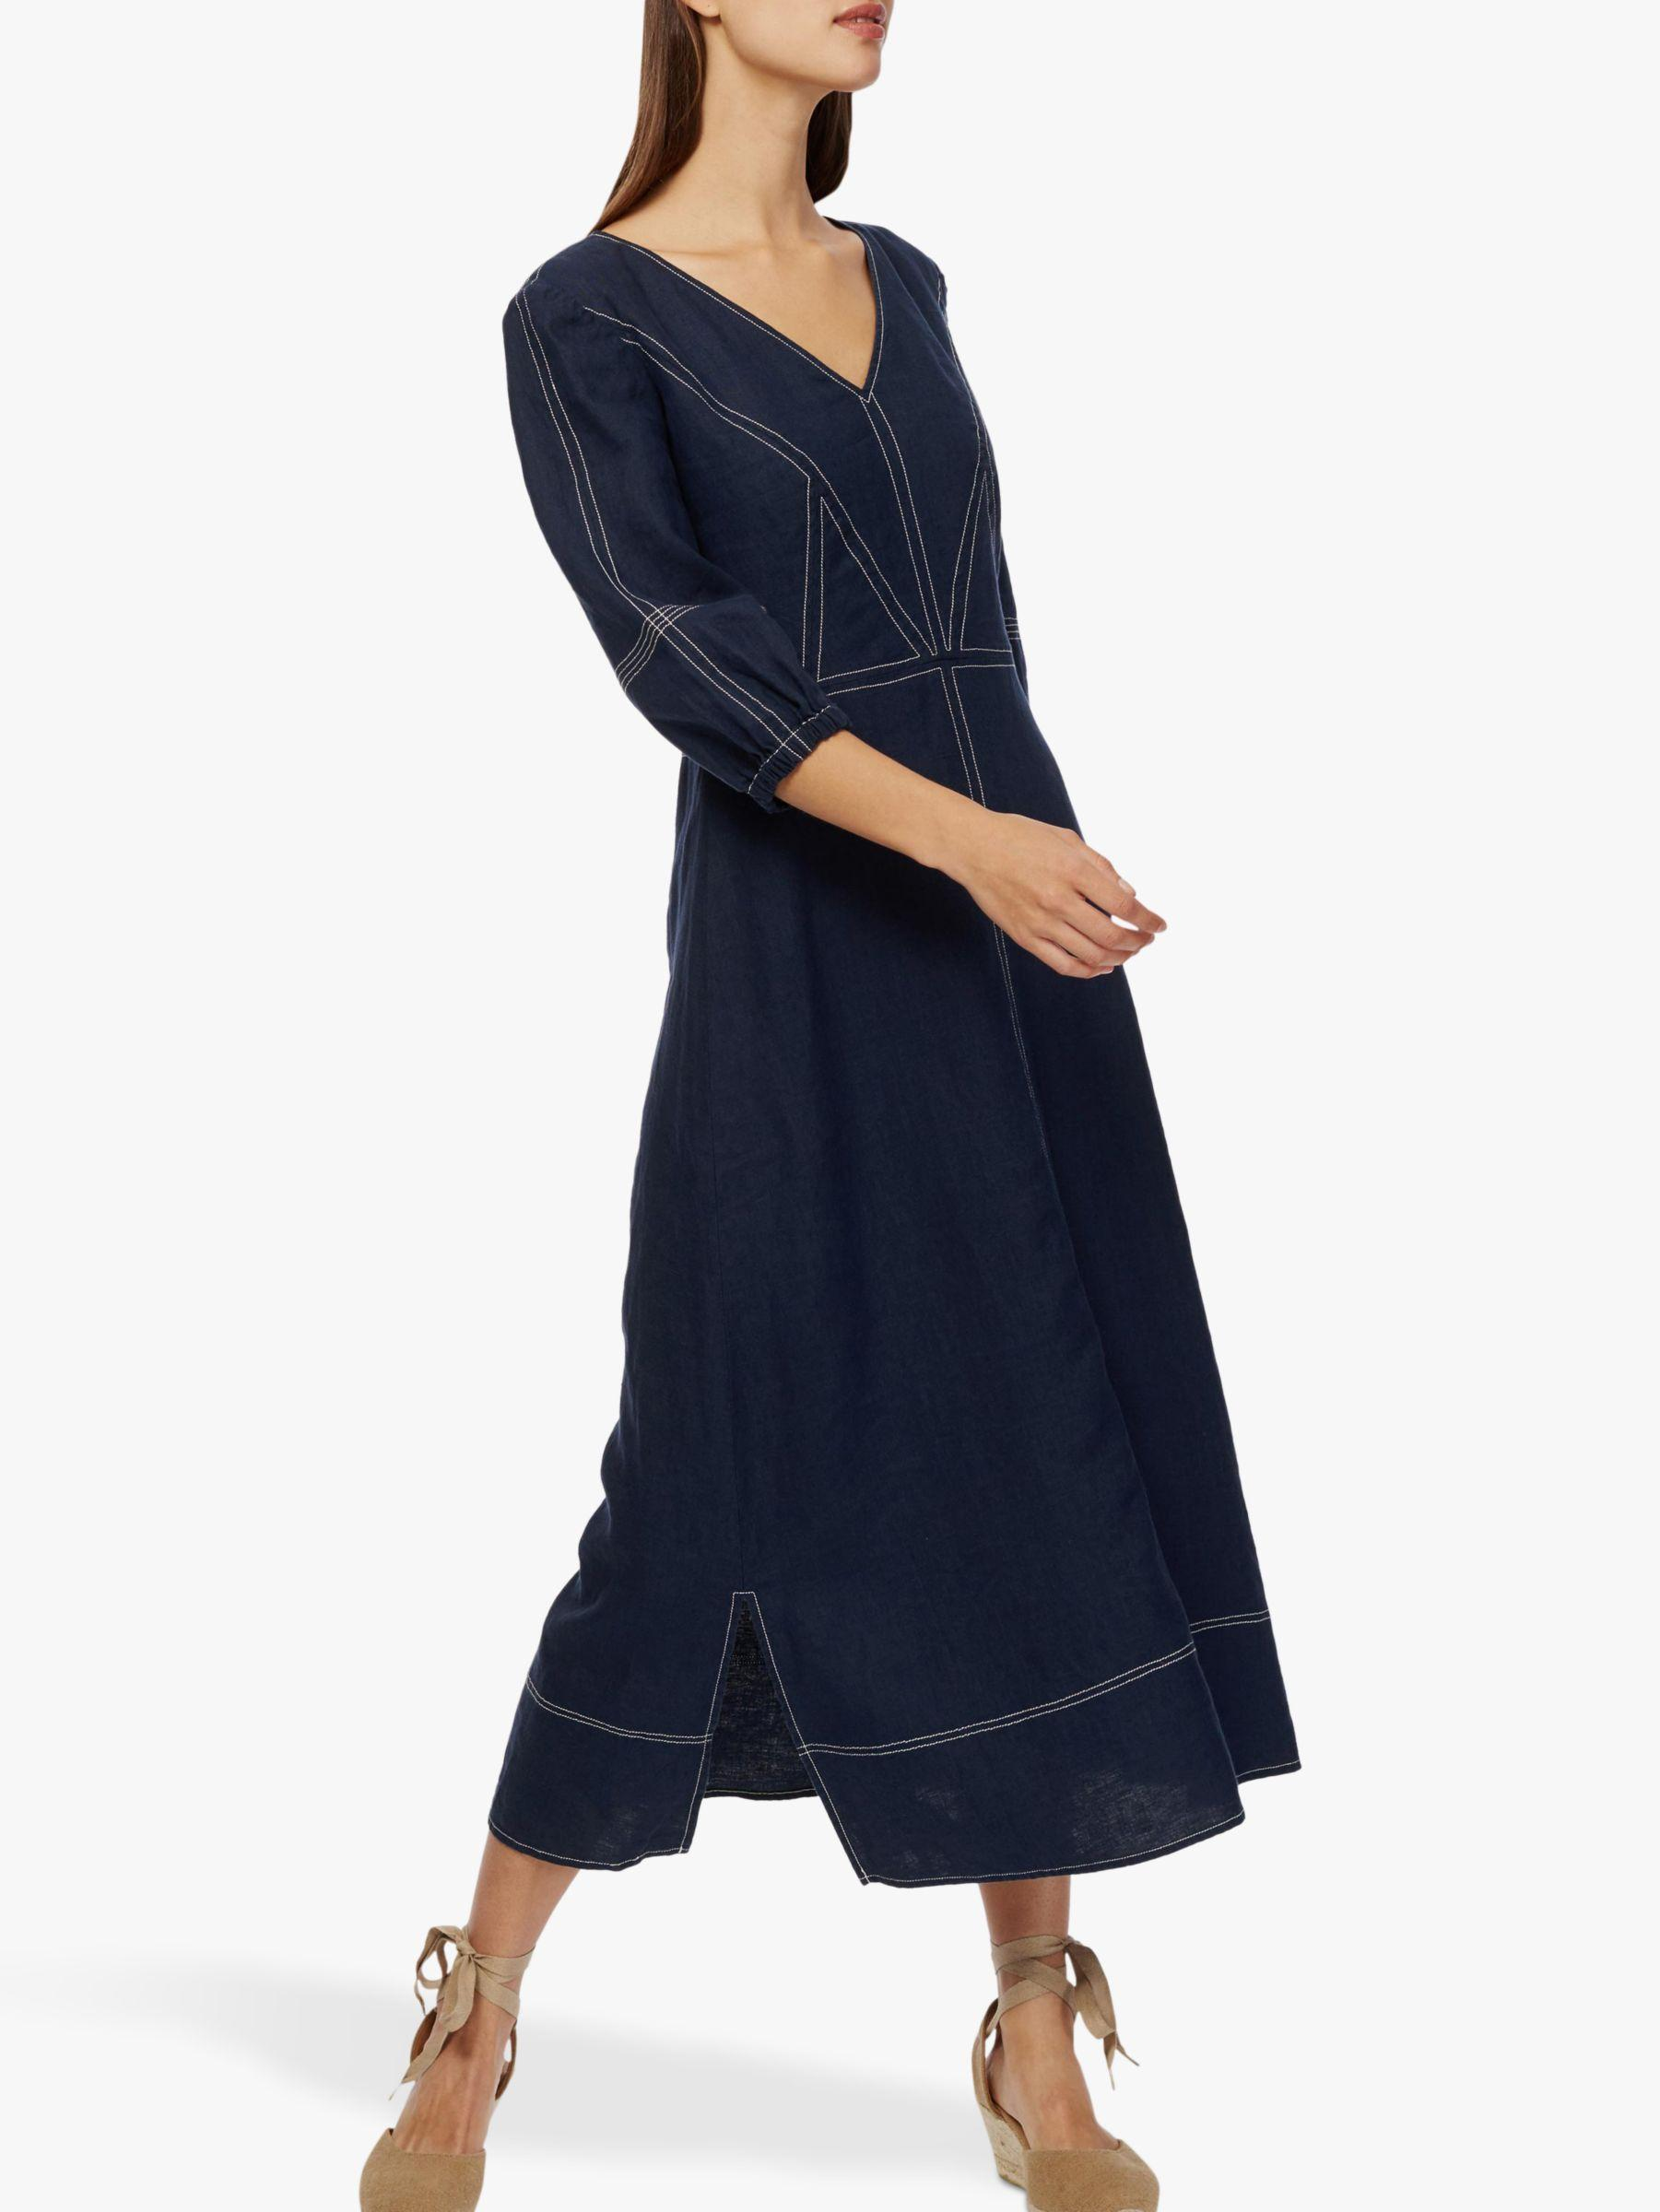 faf560f1d43 Brora Linen Contrast Stitch Dress in Blue - Lyst